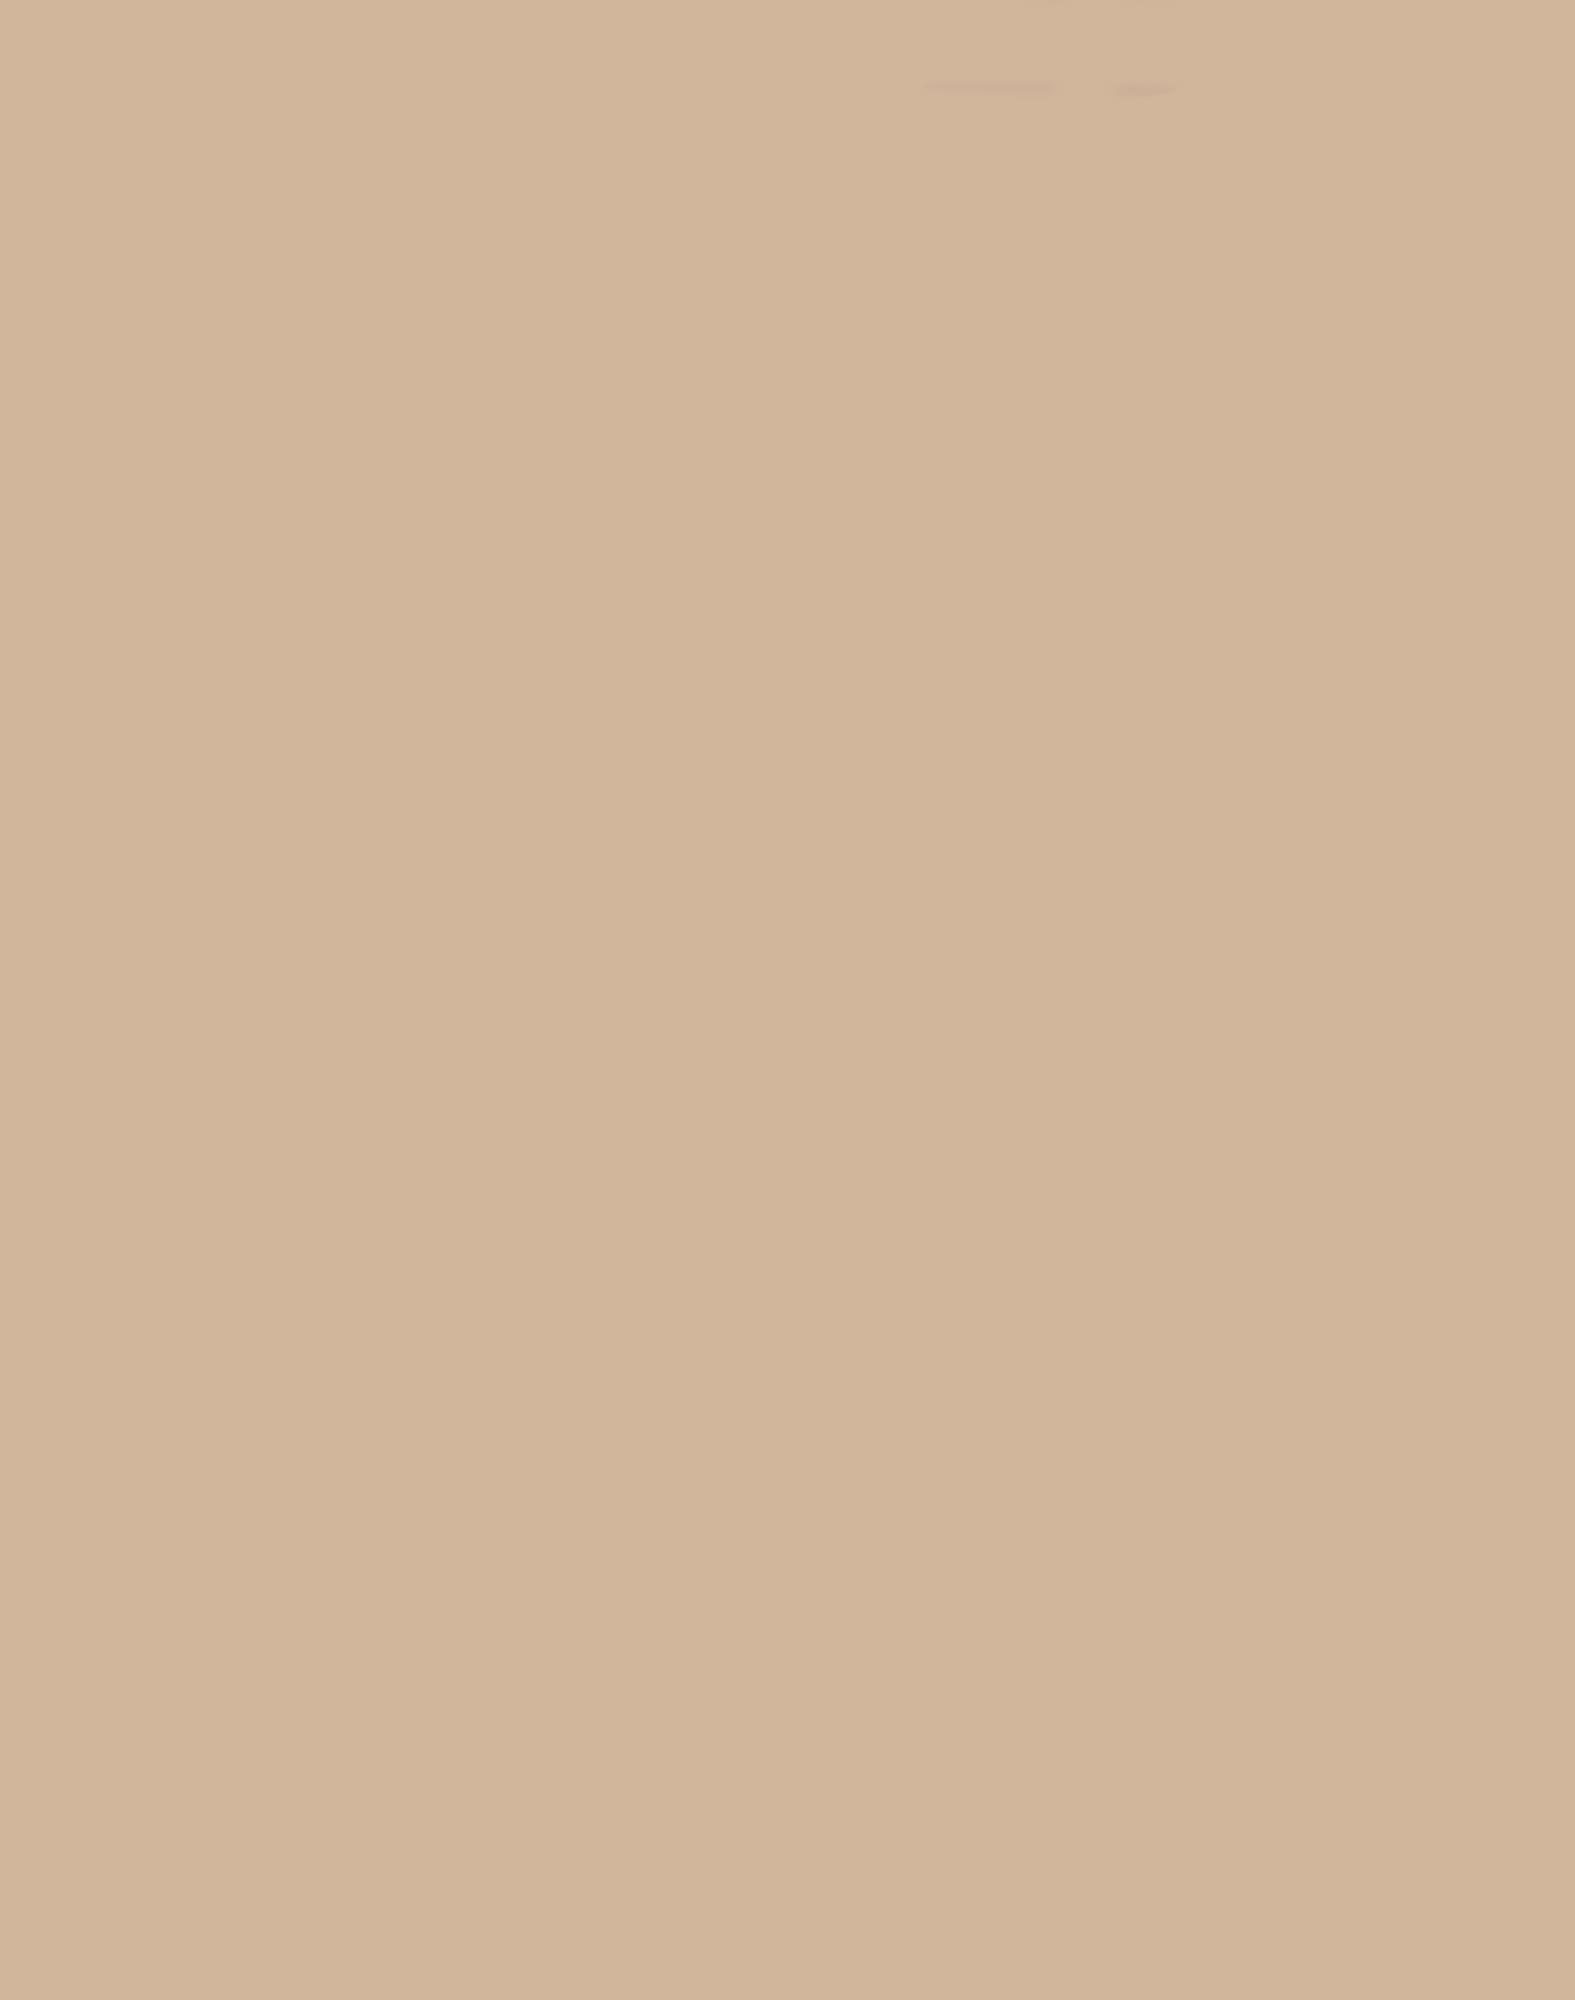 Brandy Cream 209,182,156